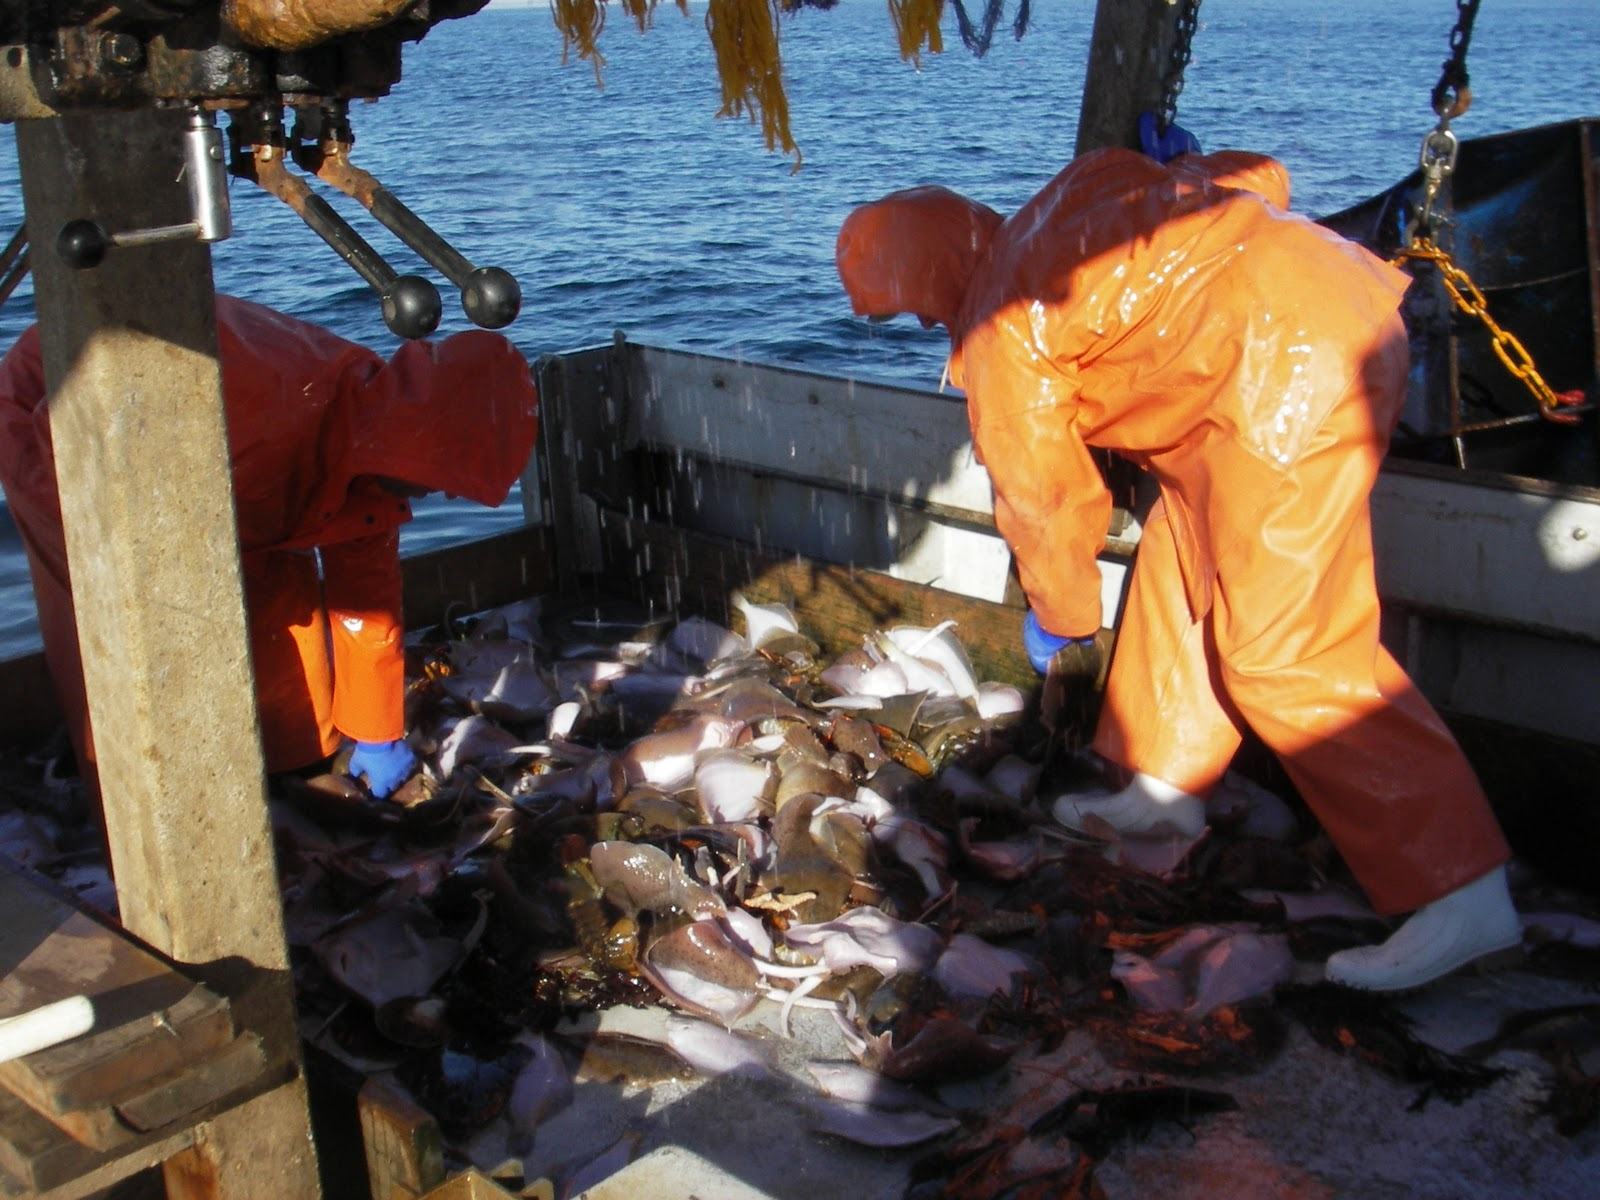 Winter flounder enhancement university of new hampshire for Winter flounder fishing